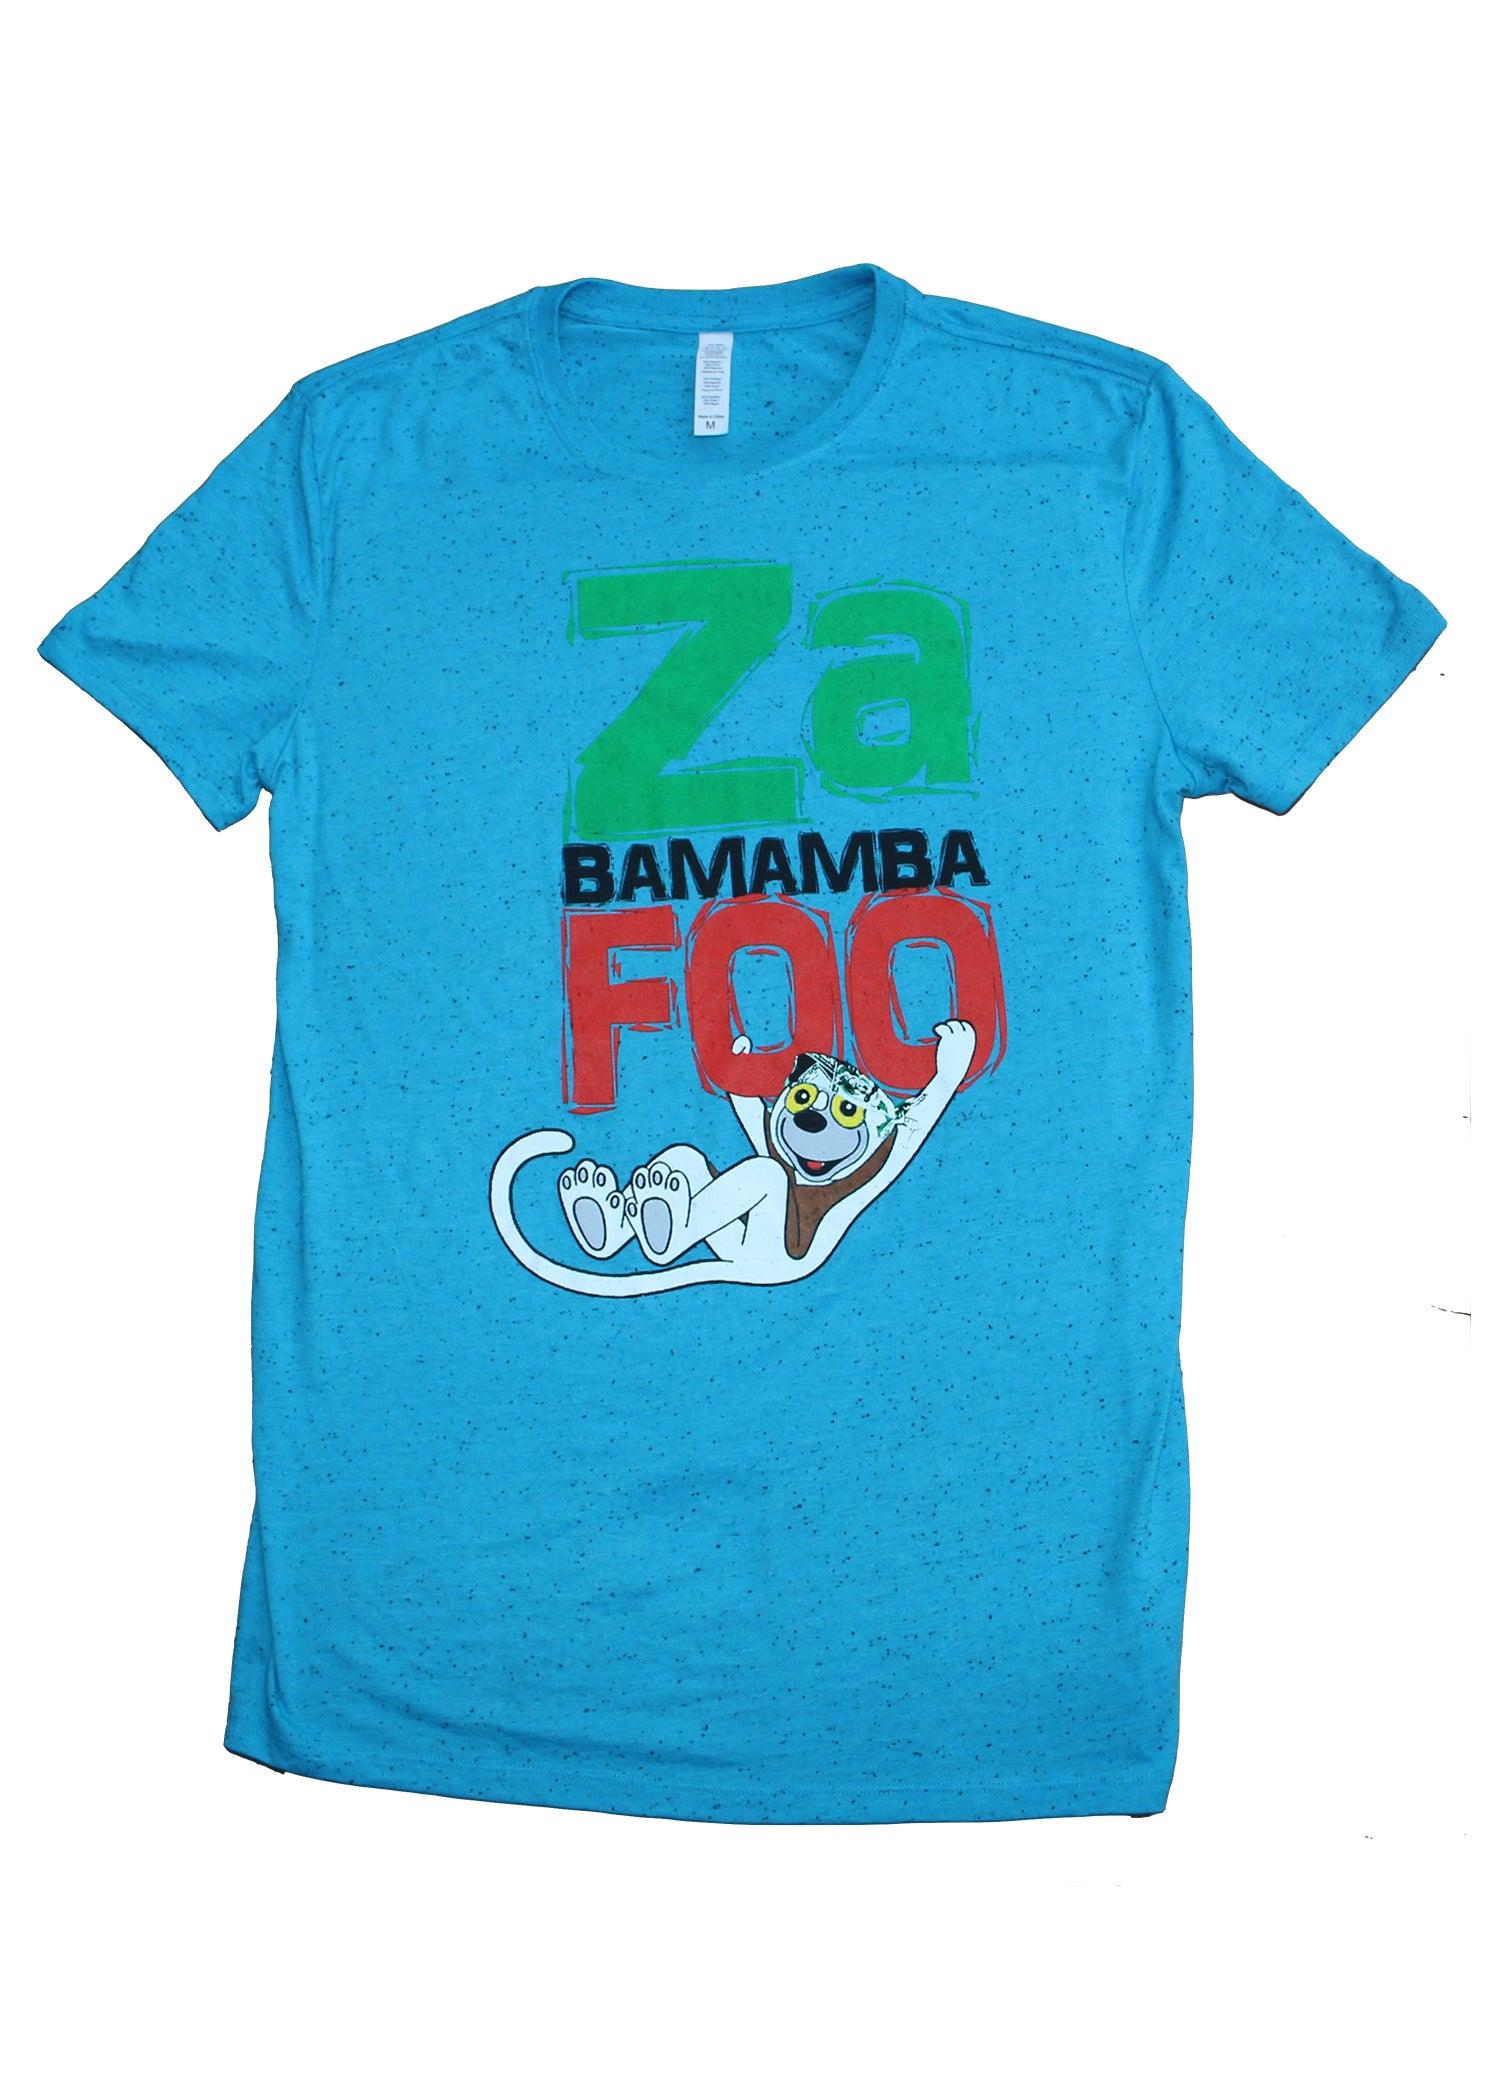 Image of Zabamambafoo T-Shirt